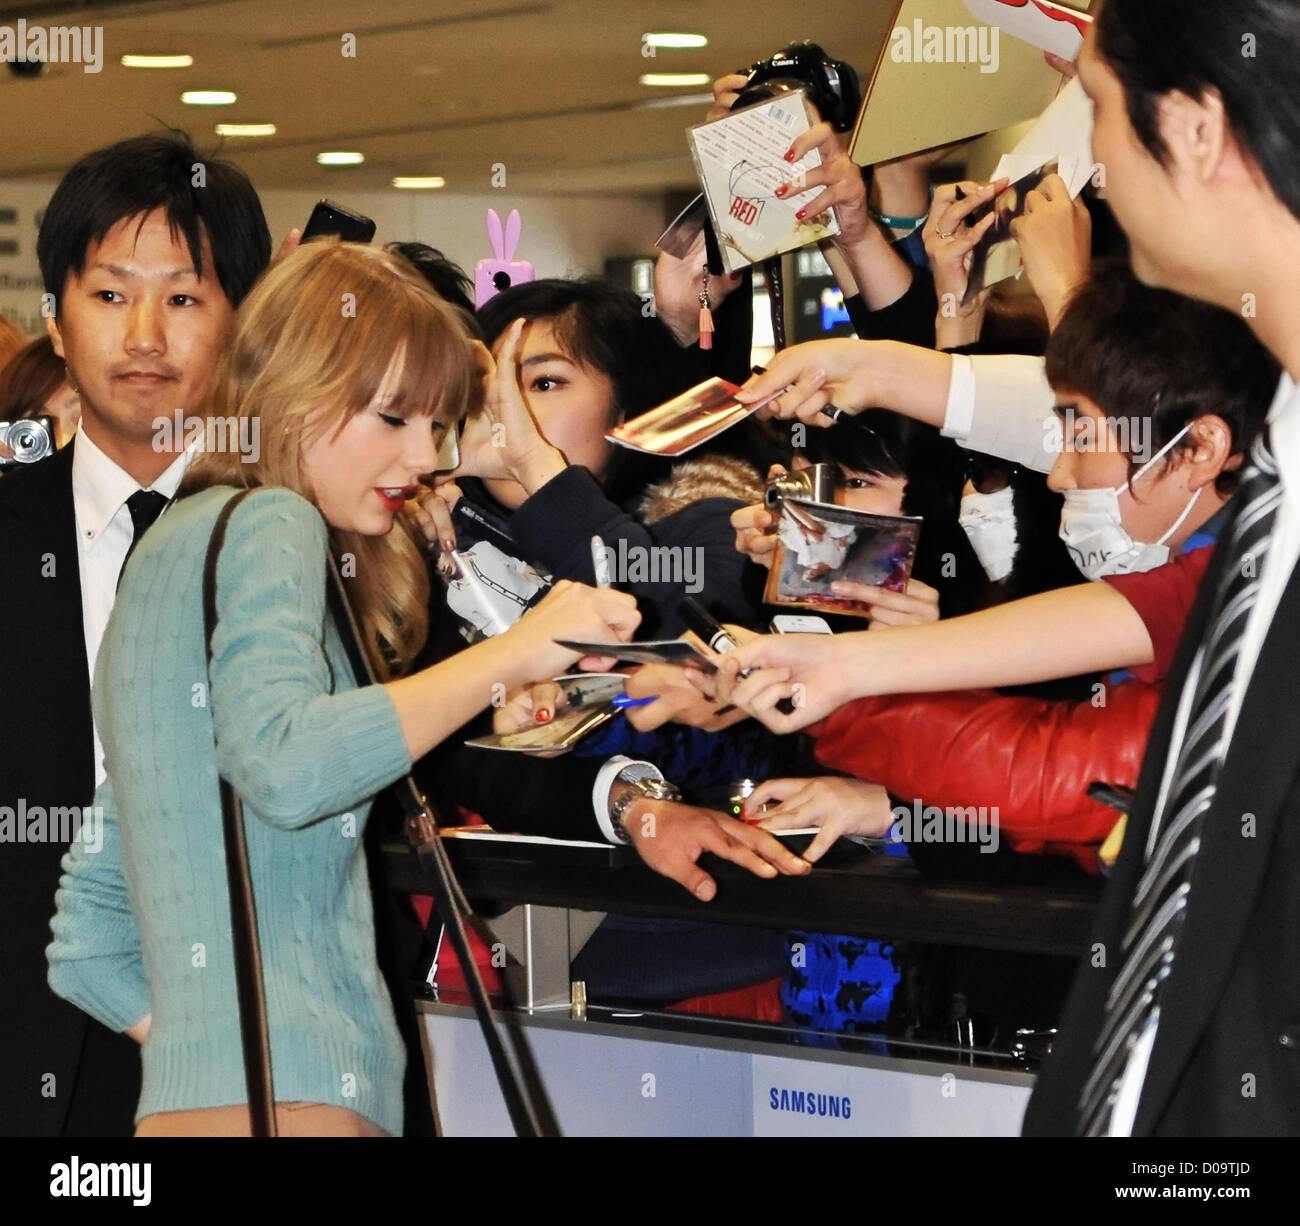 Tokyo Japan 21st November 2012 Taylor Swift Nov 21 2012 Tokyo Stock Photo Alamy